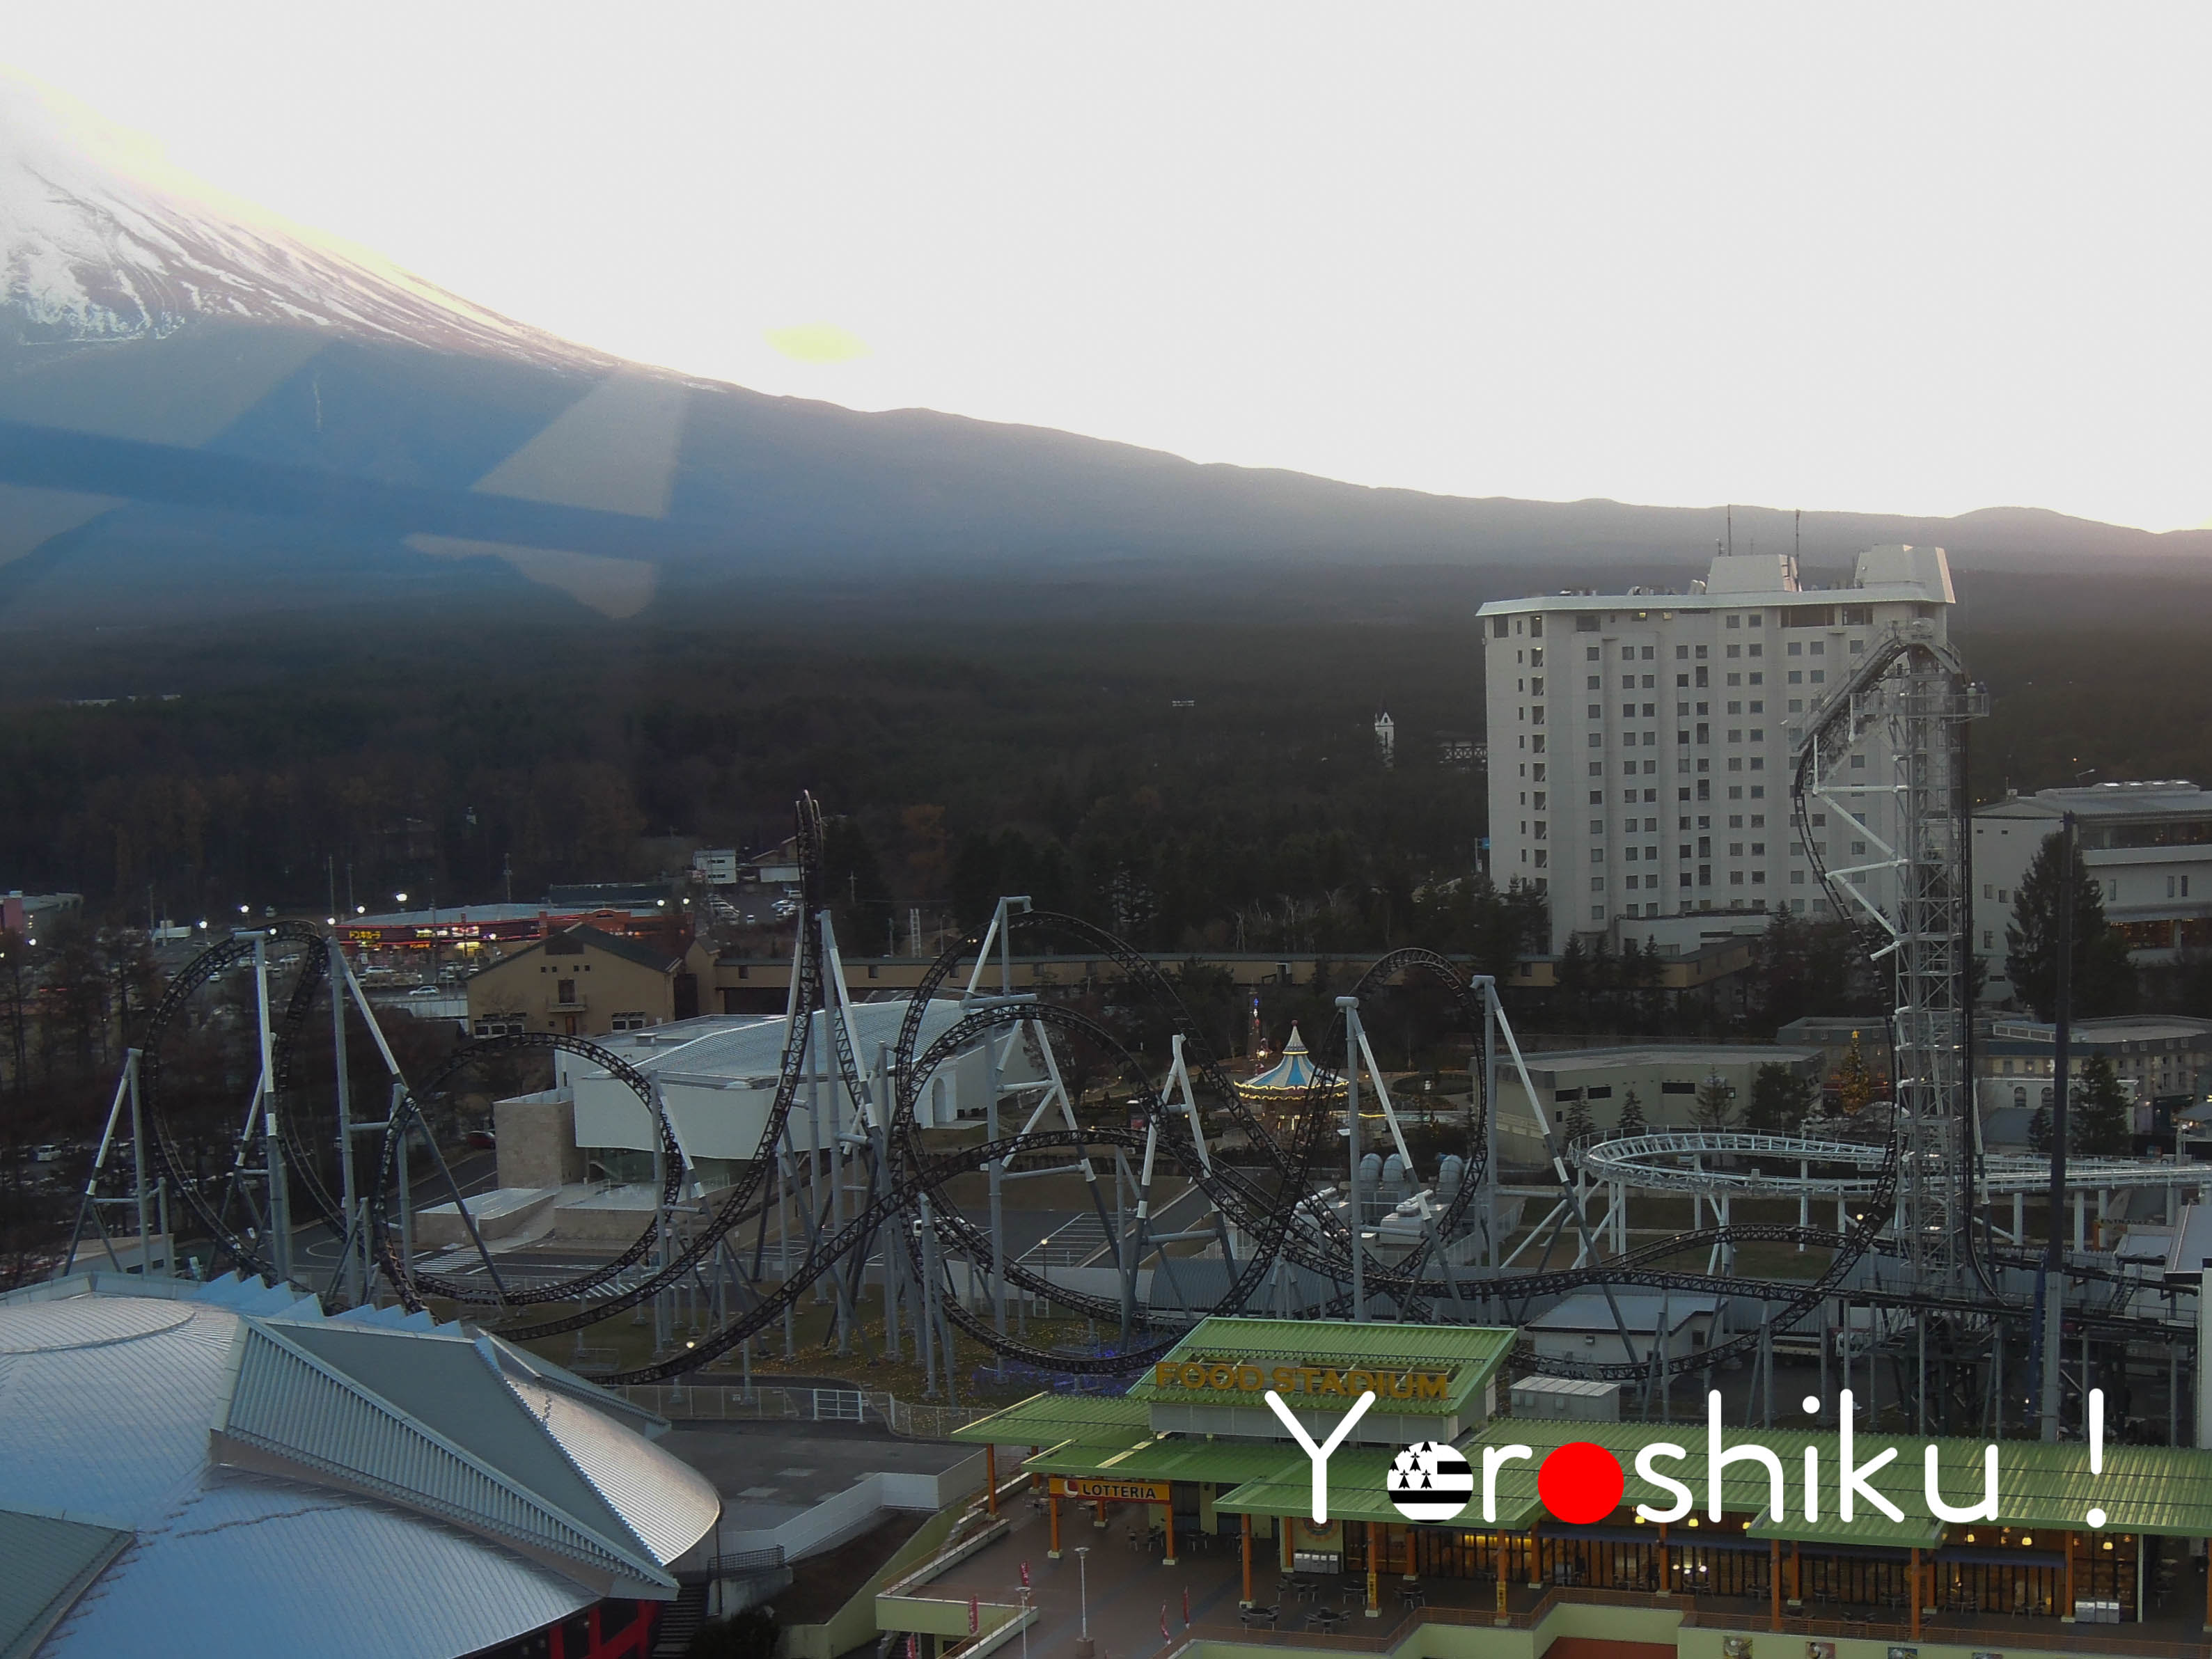 Fuji-Q Highland Takabisha Yoroshiku